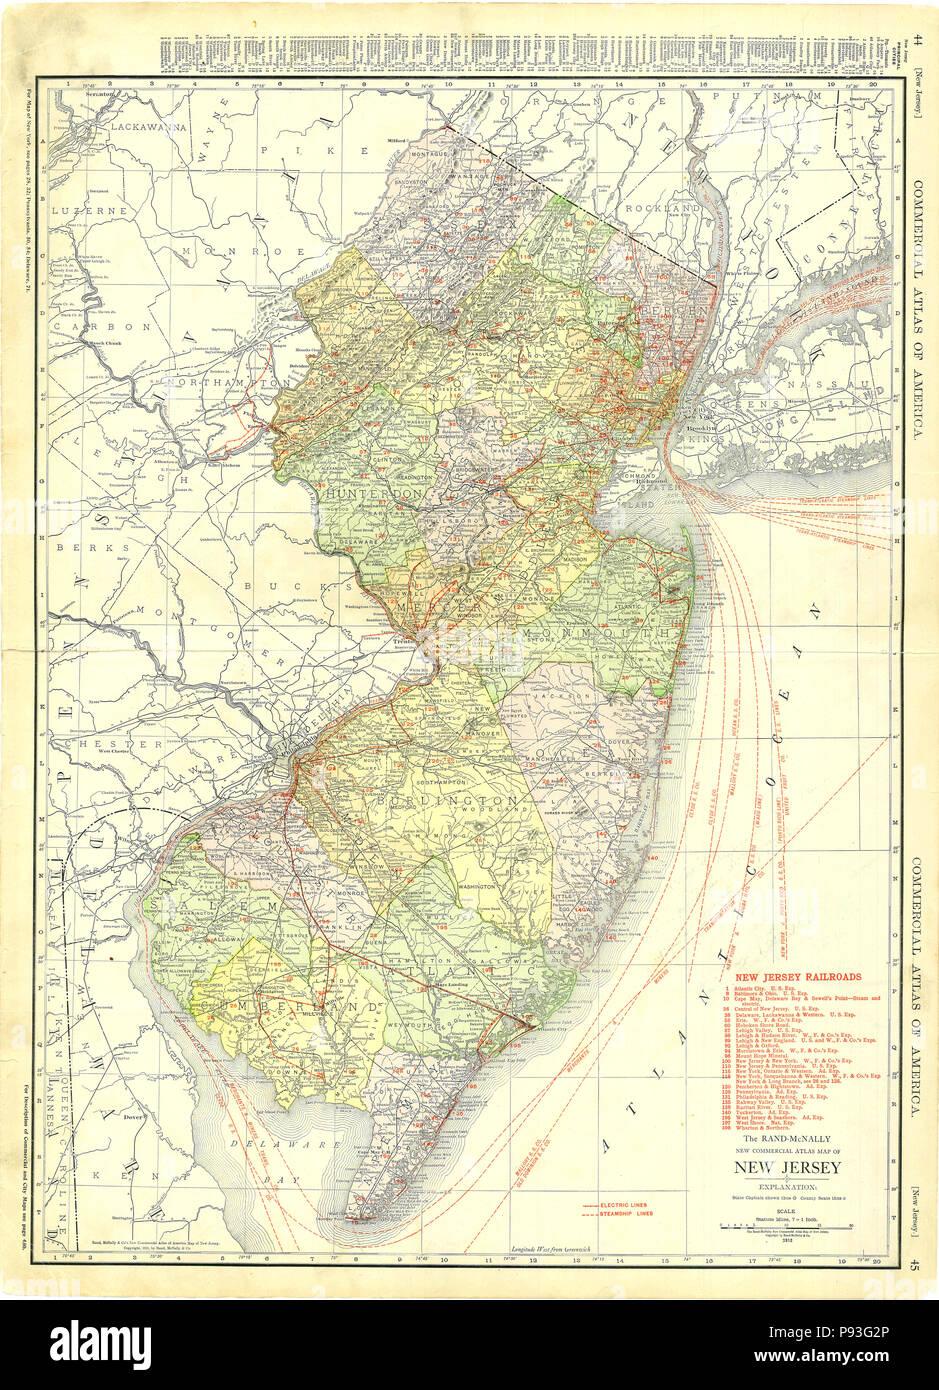 New Jersey Map Stockfotos & New Jersey Map Bilder - Alamy